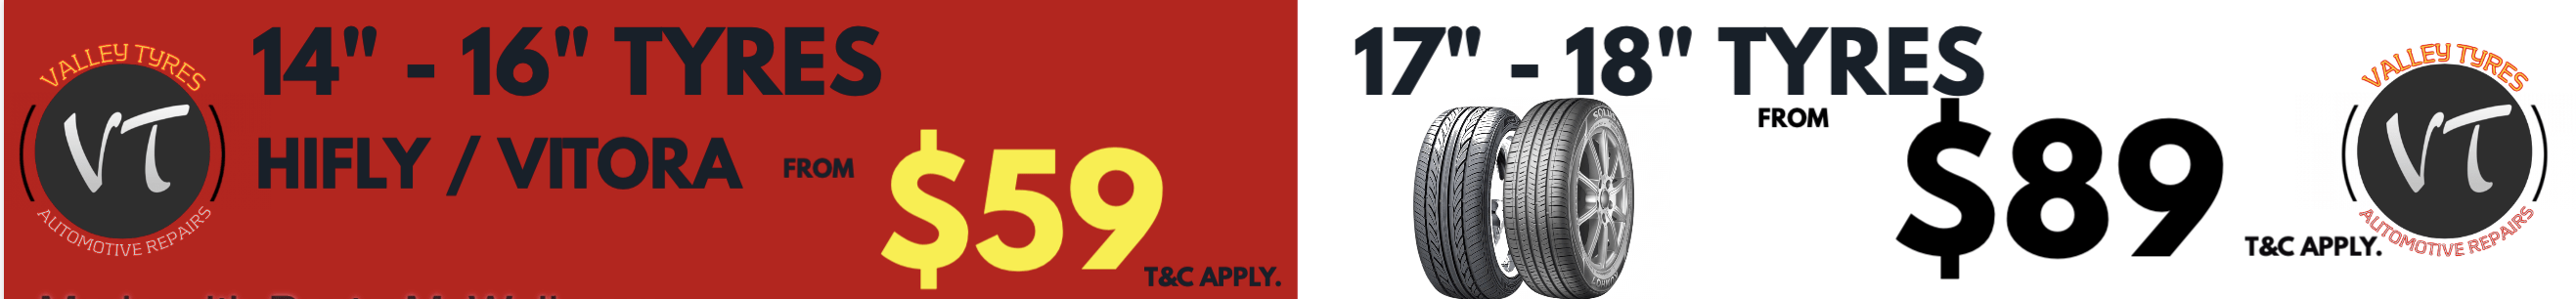 Valley Tyres Buy 3 Get 1 Free Sales